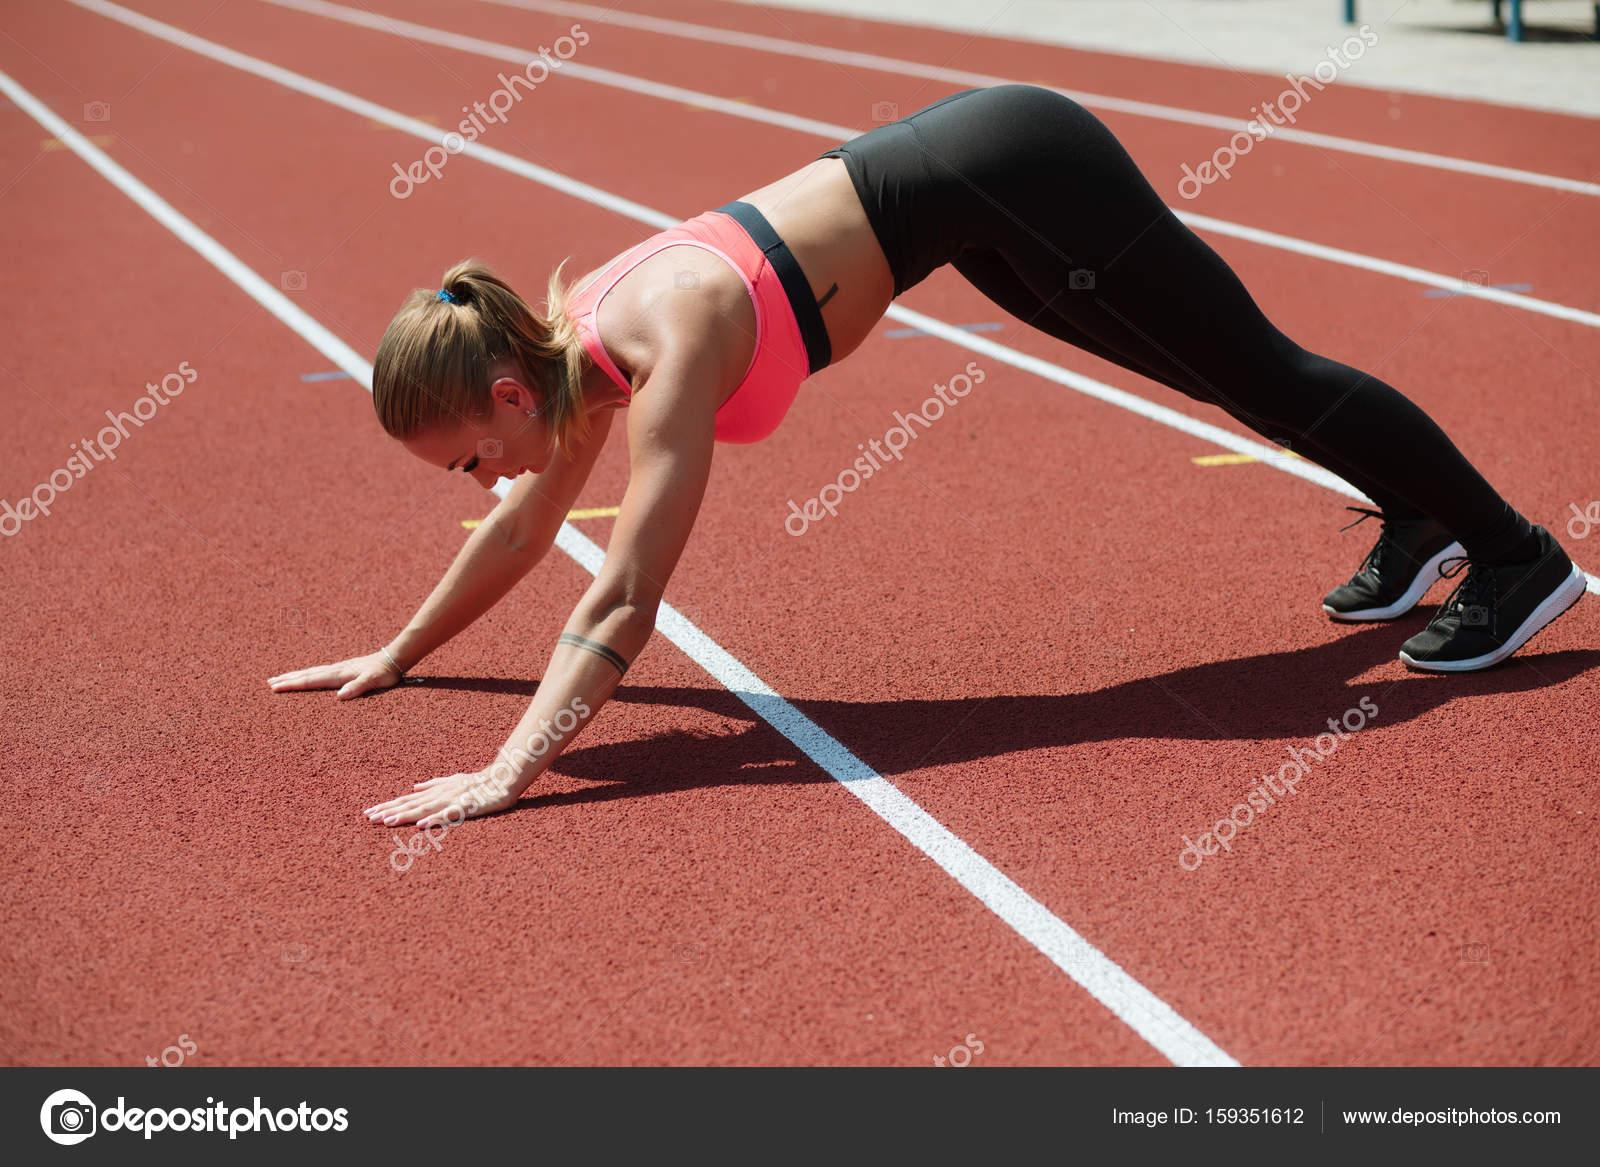 9b8f0b46213 Νεαρή γυναίκα σπορ αθλητής σε αθλητικά είδη διαδρομών στο στίβο του  σταδίου, υπαίθρια προπόνηση —